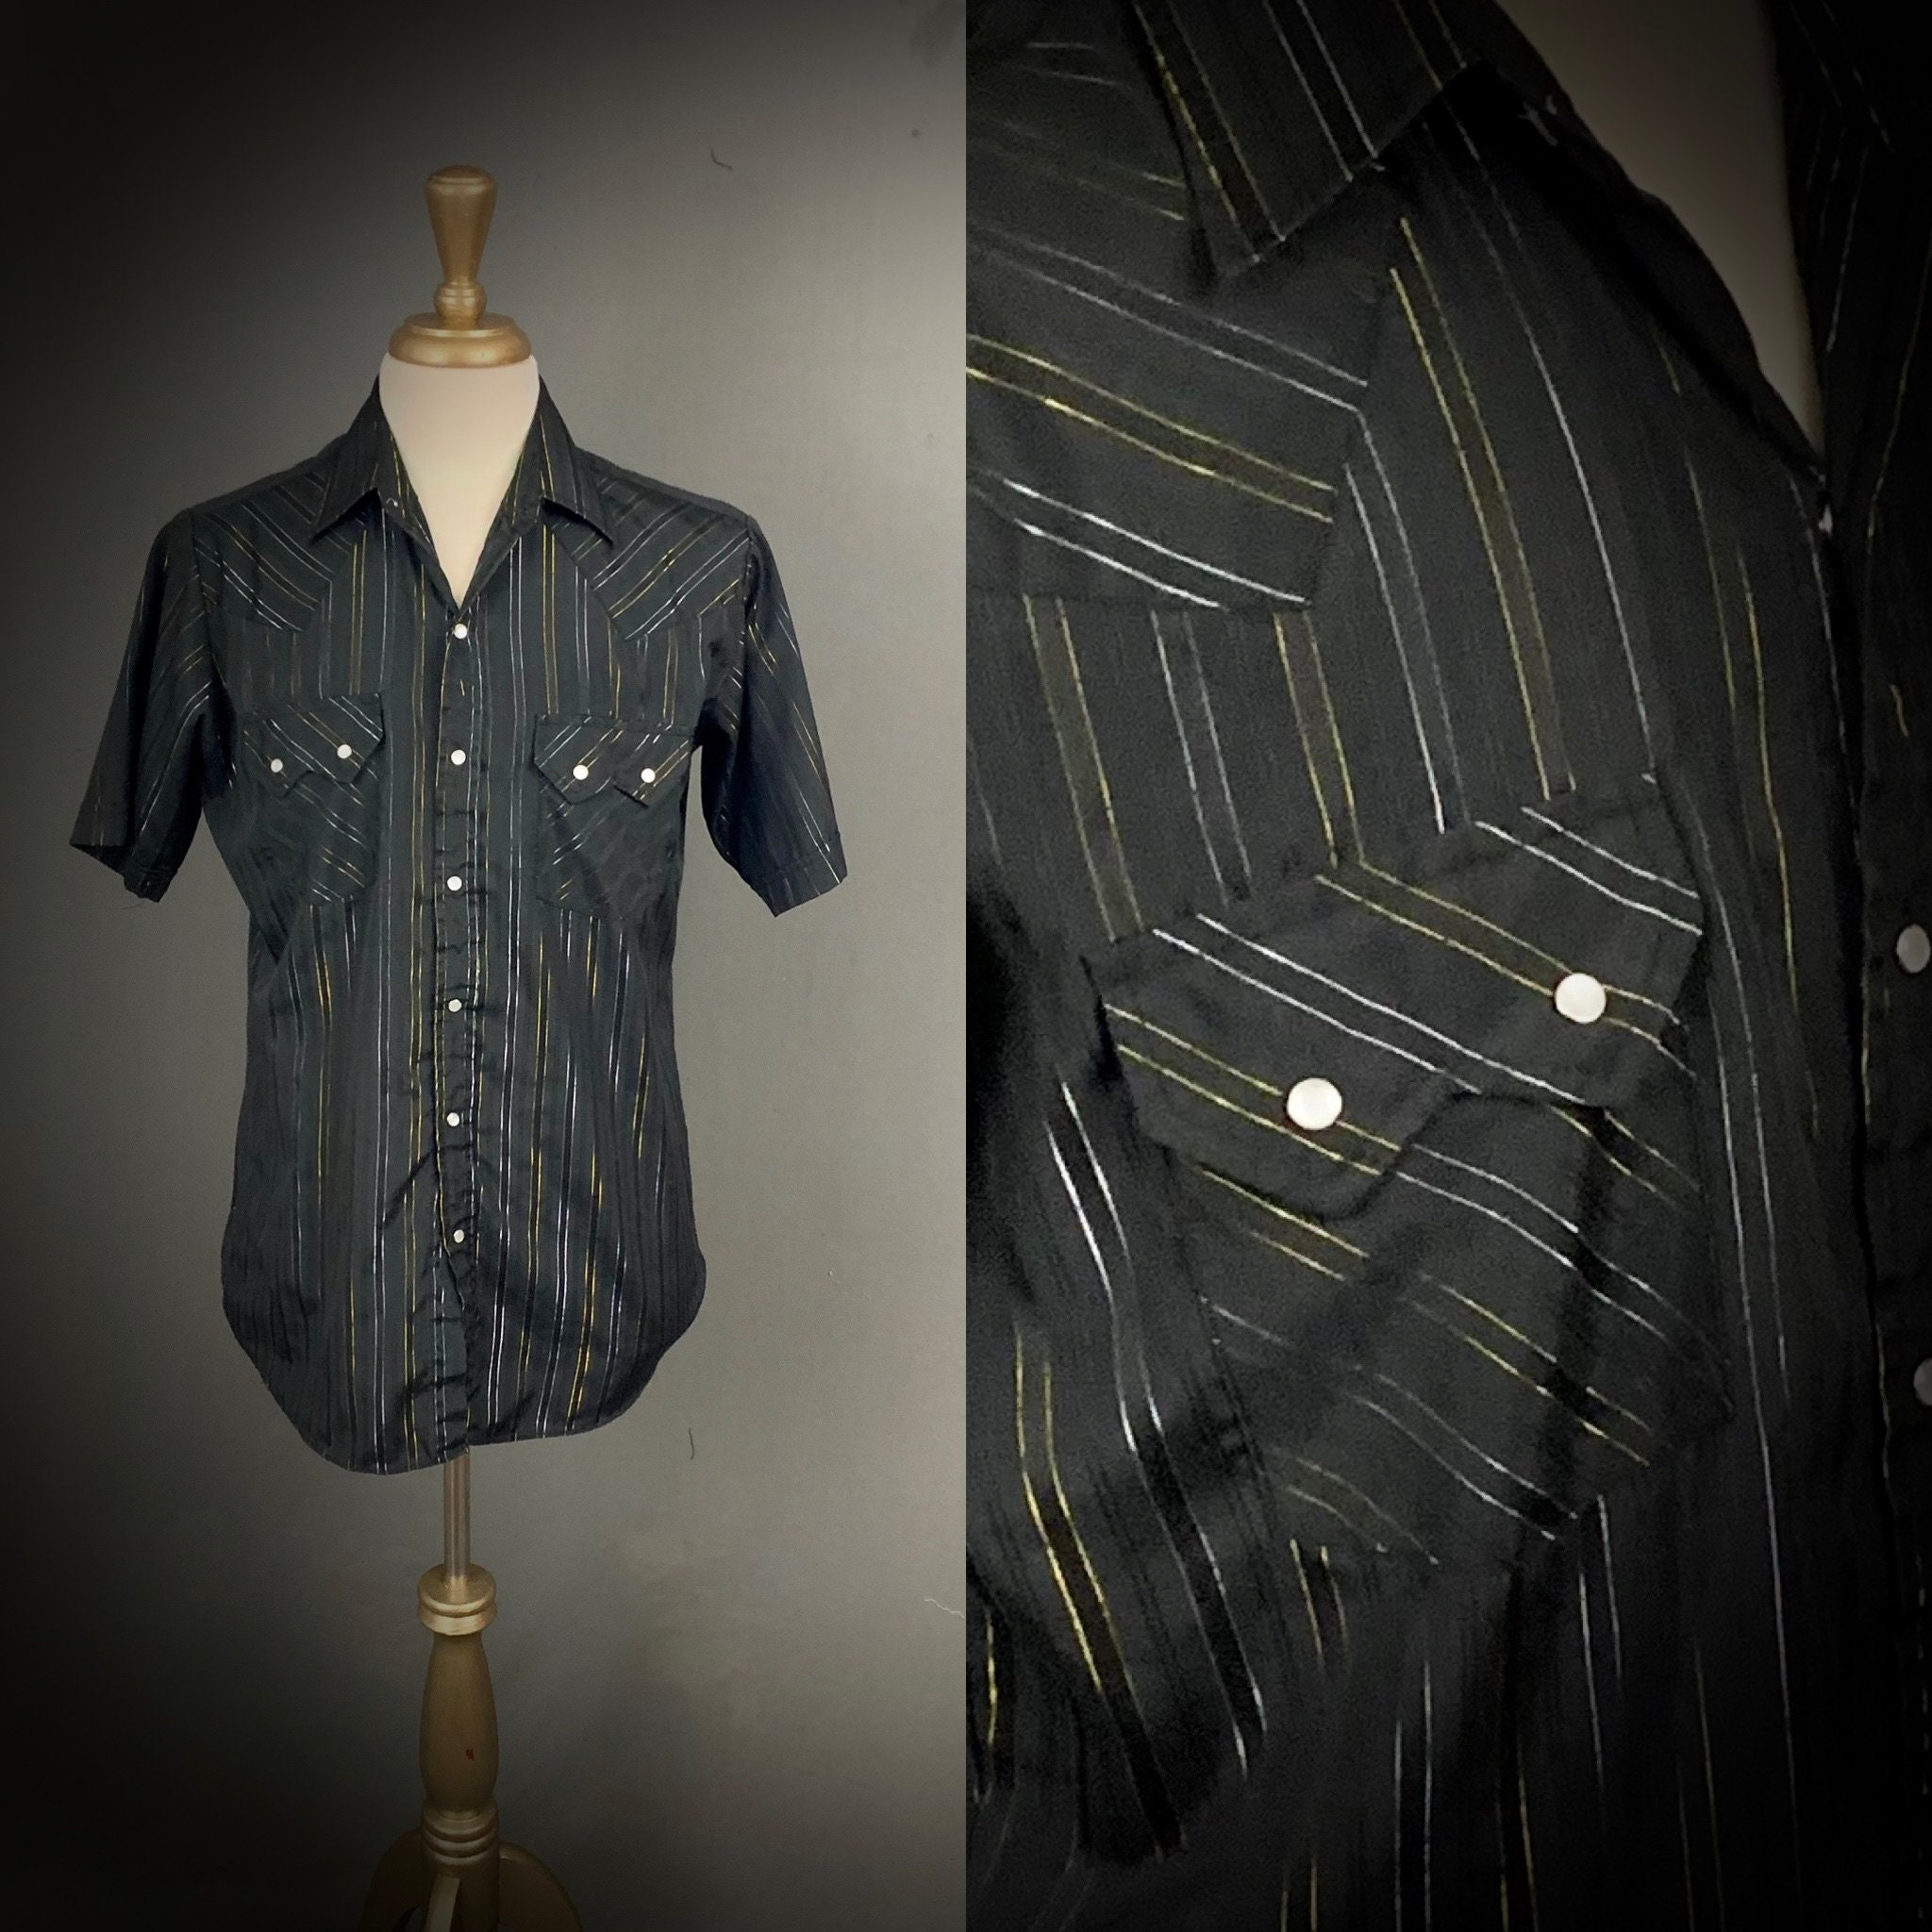 1970s Mens Shirt Styles – Vintage 70s Shirts for Guys Mens Vintage Ely Cattleman Pearl Snap Button Short Sleeve Shirt Size Medium $0.00 AT vintagedancer.com